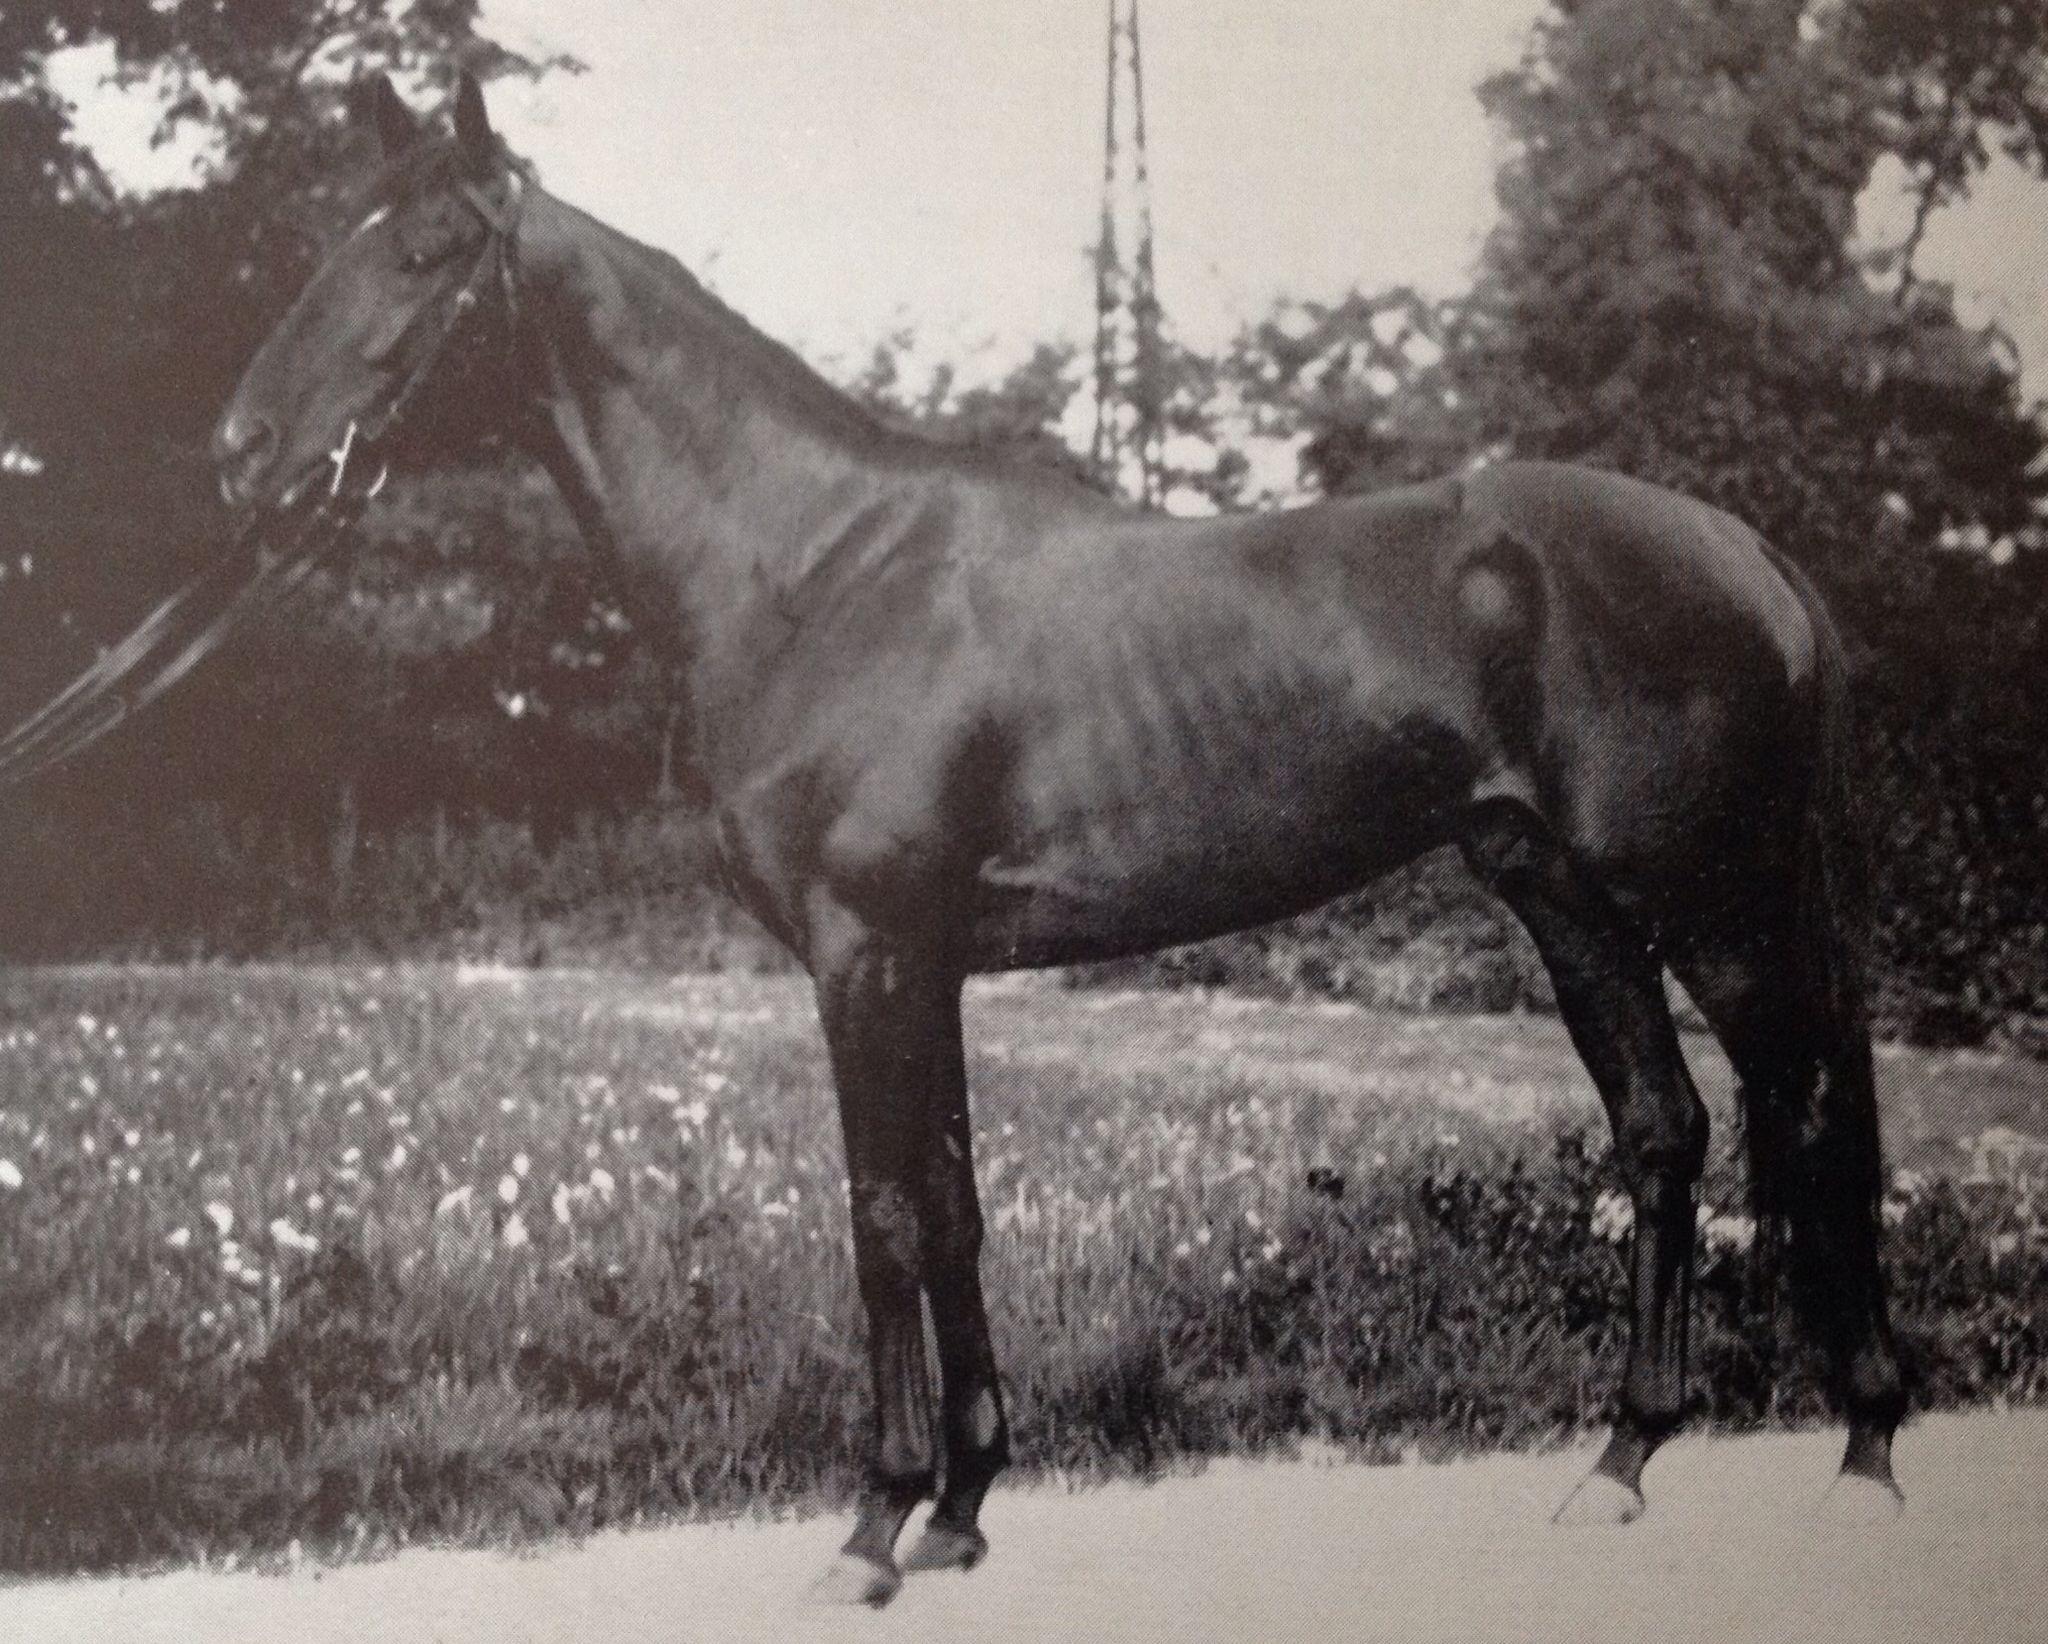 NAVARRO (Ity) CH C 1931, Michelangelo - Nuvolona (GB). Winner 1934 Gran Premio di Milano, Gran Premio d'Italia, both in record time. Not a very sound horse but a singularly brilliant one. Headed the list of sires of winners in 1943 and again in 1946.